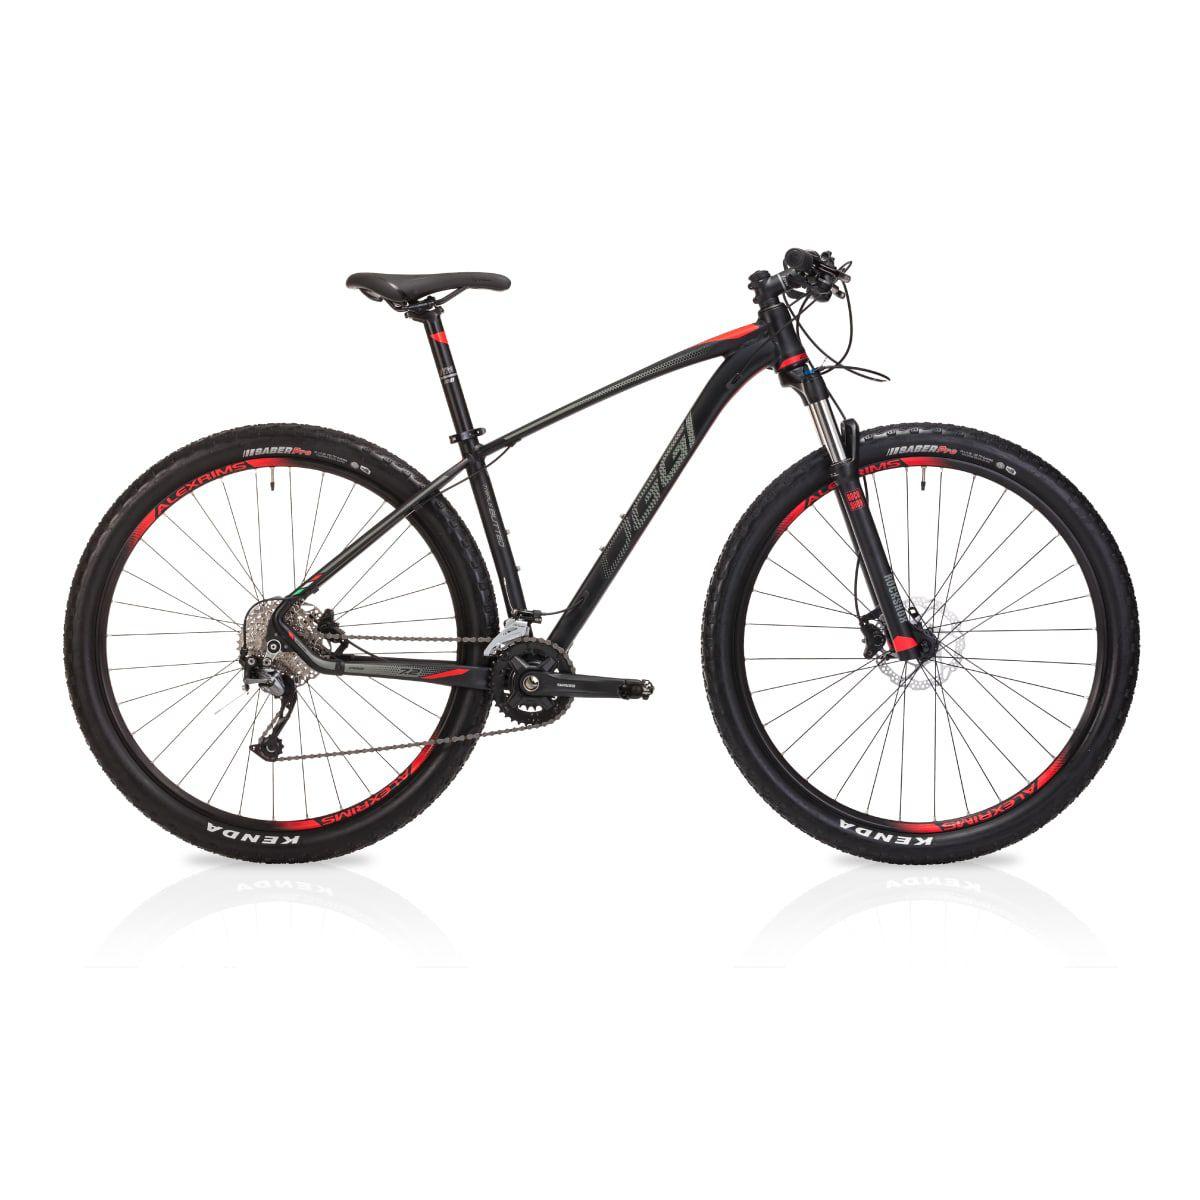 Bike Oggi Big Wheel 7.2 2019 18V Cabos Internos Alívio